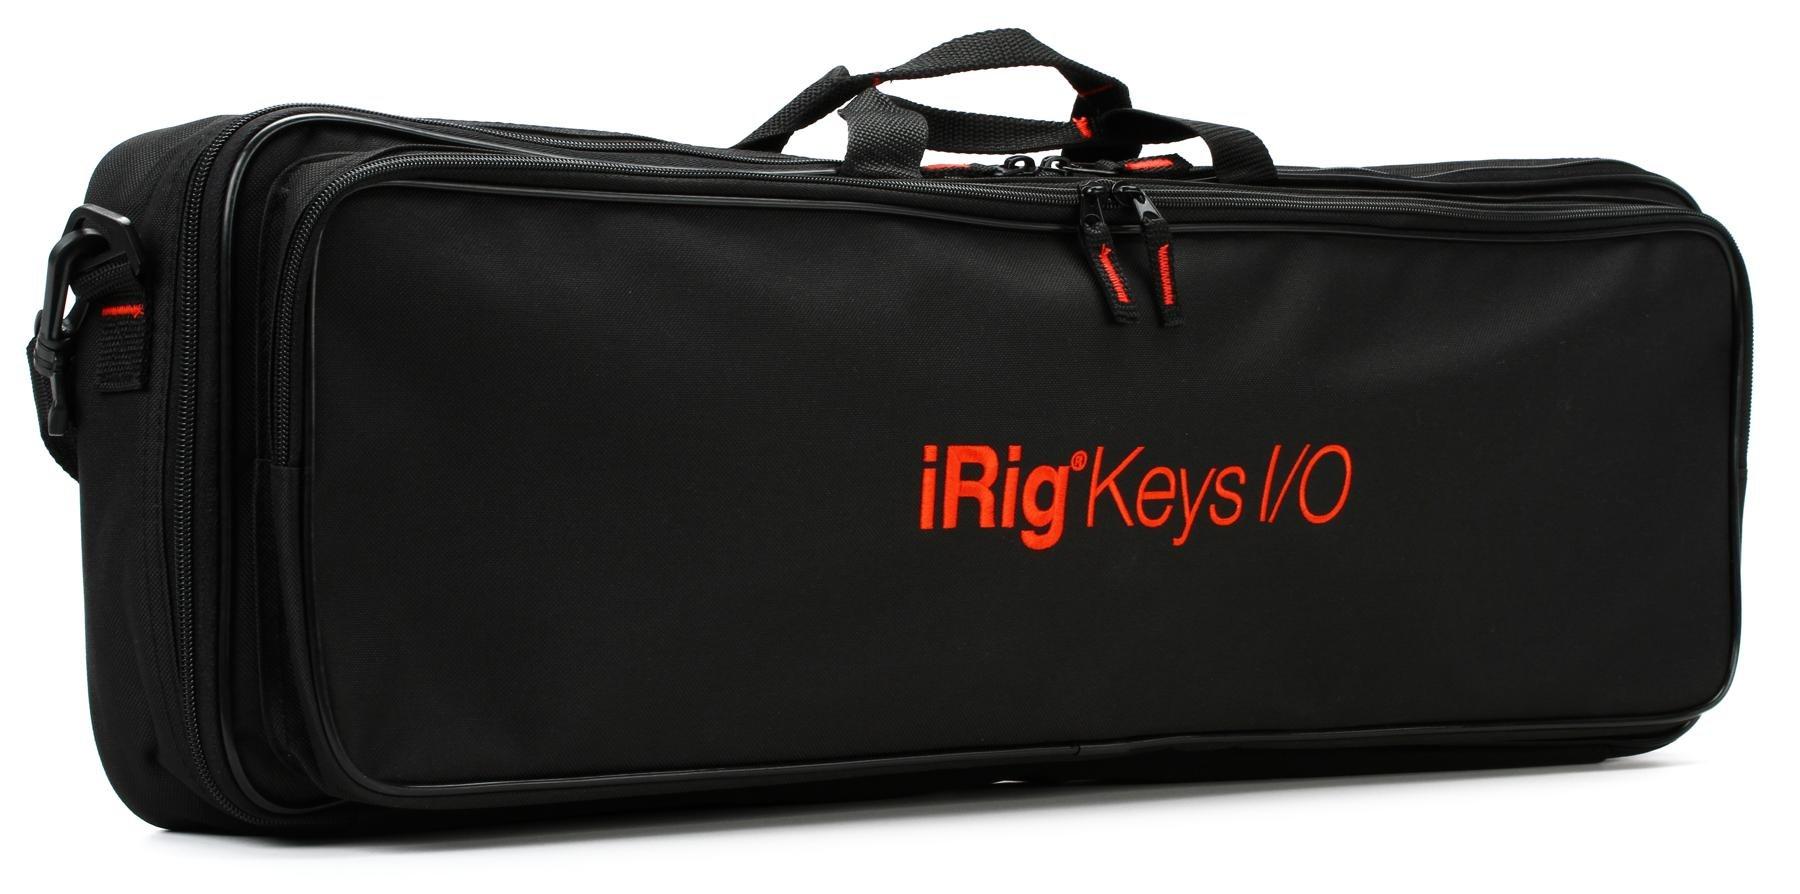 IK-Multimedia-iRig-Keys-Borsa-per-iRig-Keys-sku-2258771210001